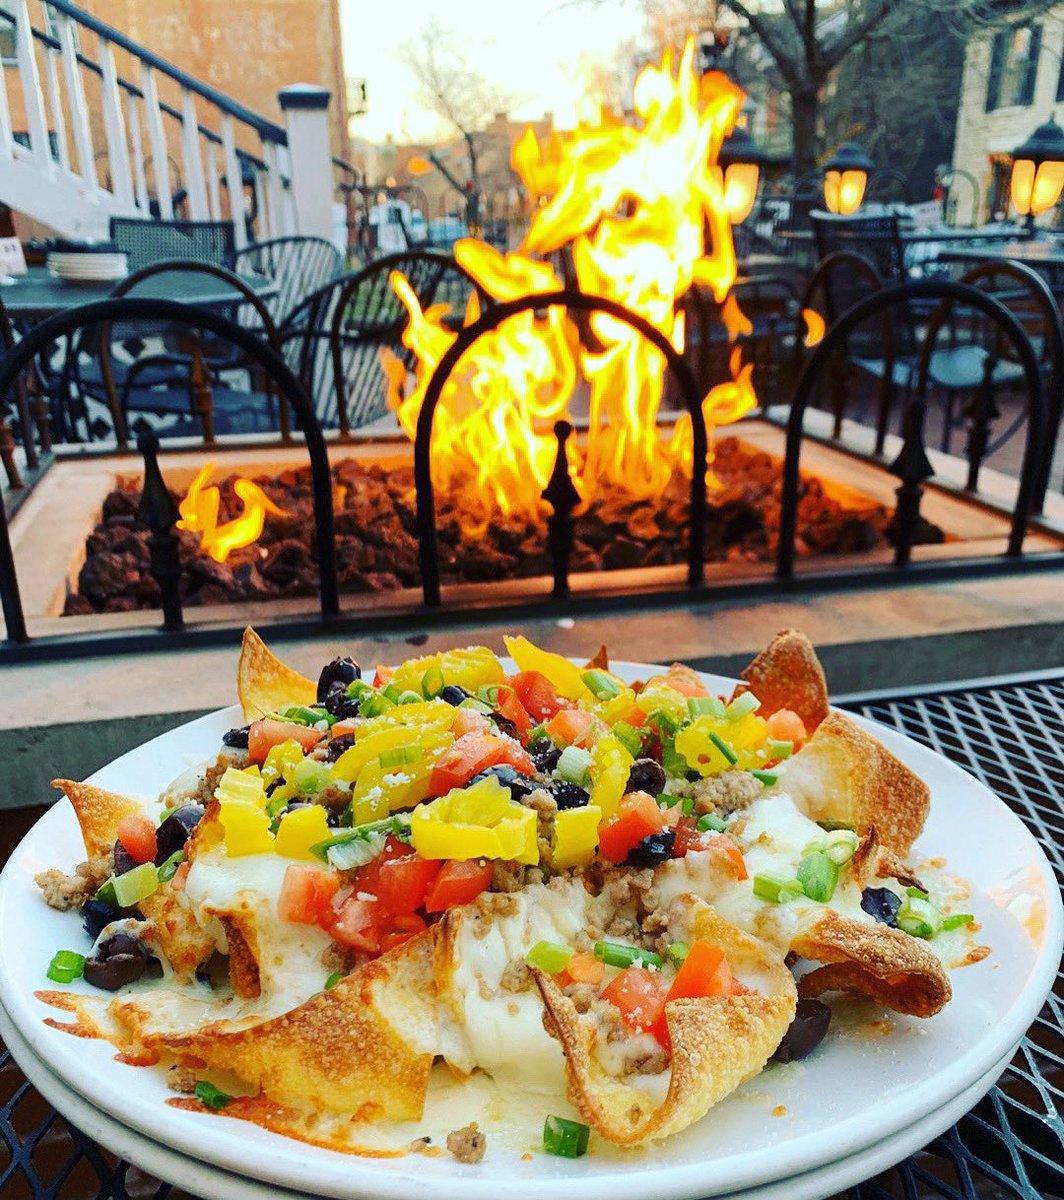 Italian Nacho kinda day... paired with vino 🍷 and fire pit 🔥, of course @bellavinowinebarstl 🥰 #nacho #italiannachos #tapas #patio #firepit #winebar #favorite #foodie #datenight #daydate #perfection #cravings https://t.co/KtZHlTbZv9